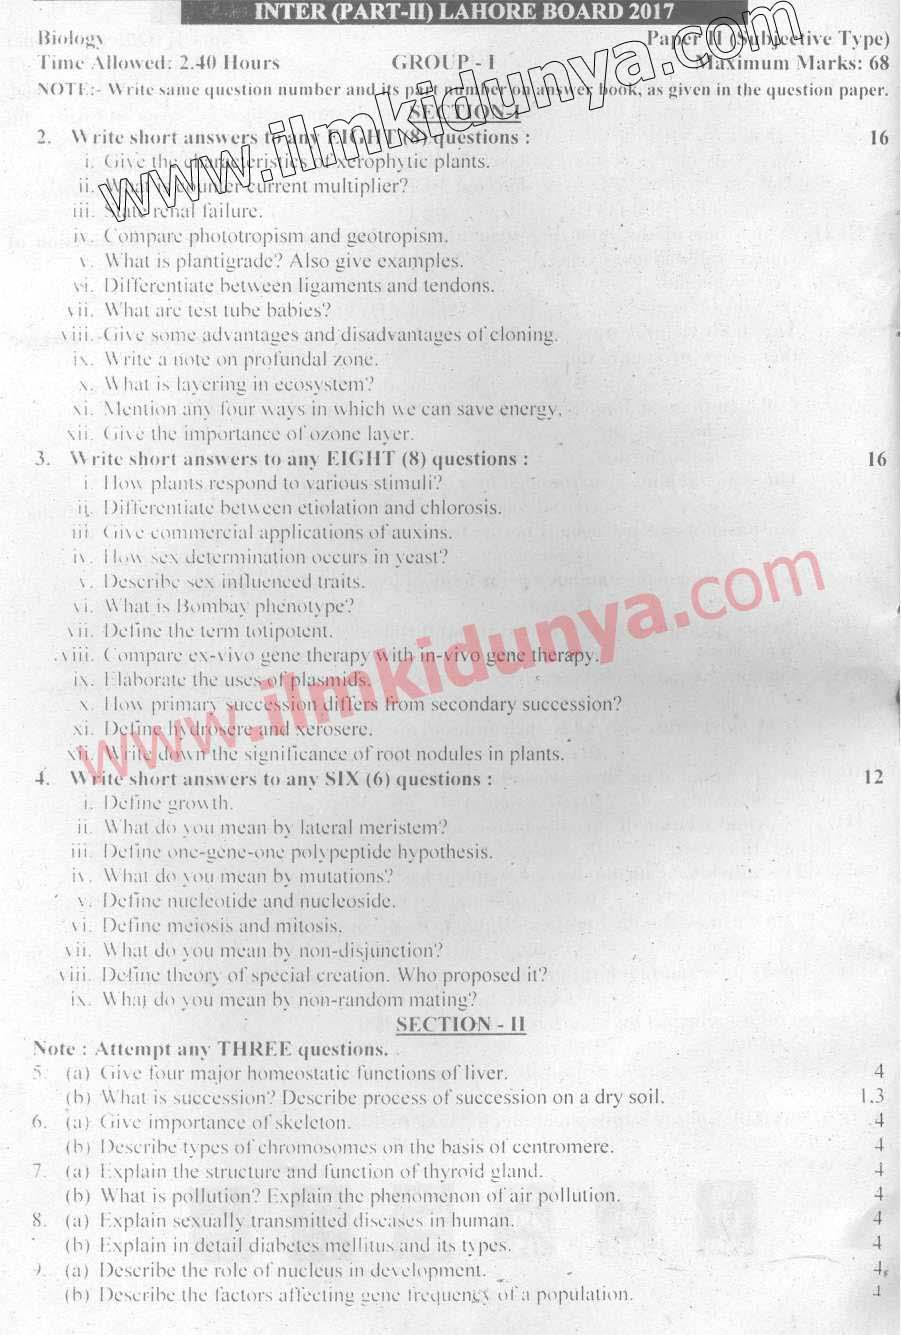 Nfwl-nra bill of rights essay contest 2012 winners